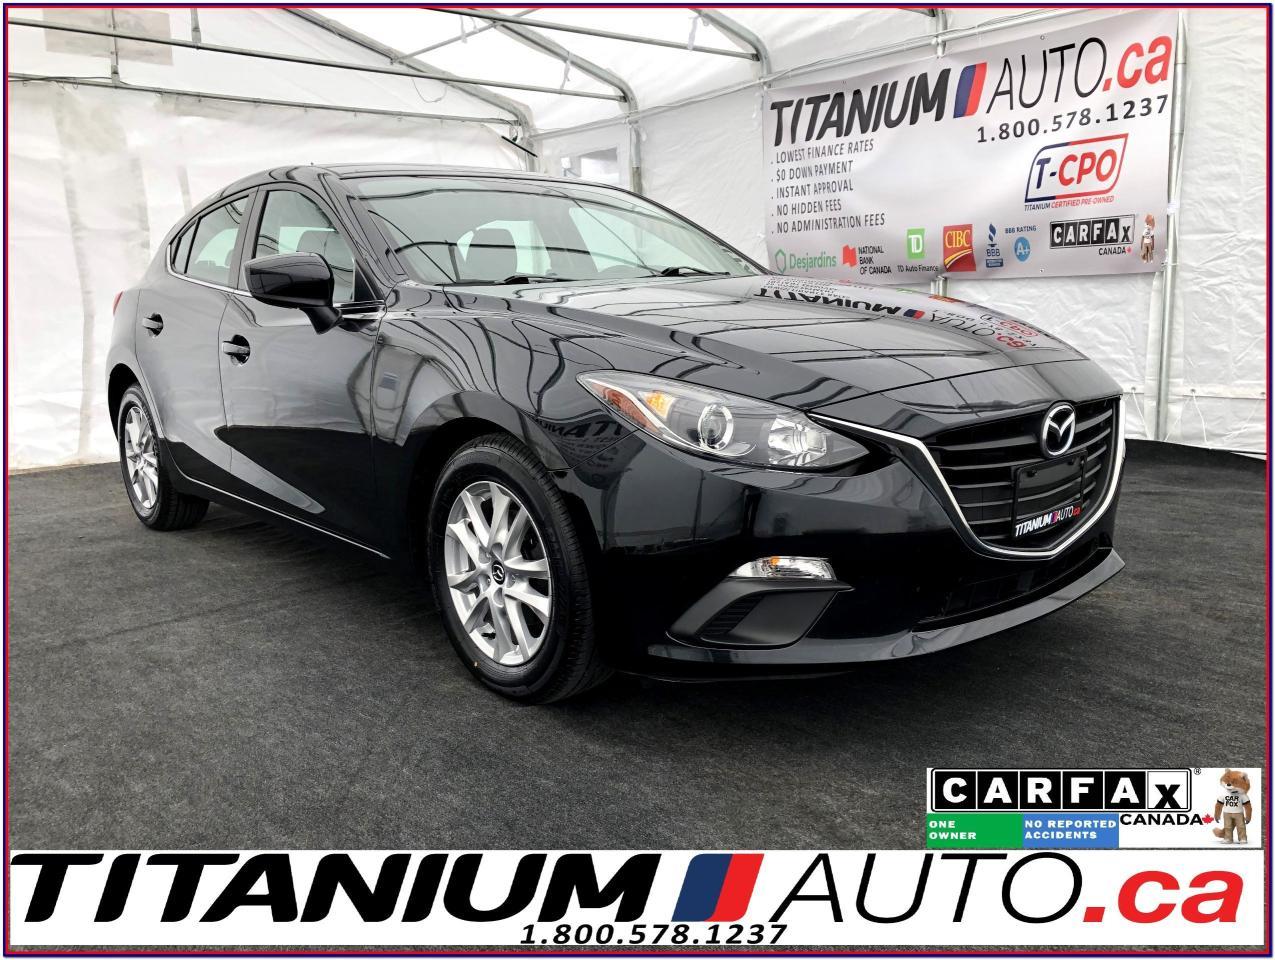 2015 Mazda MAZDA3 GS SPORT HatchBack-GPS-Camera-Heated Seats+Bluetoo